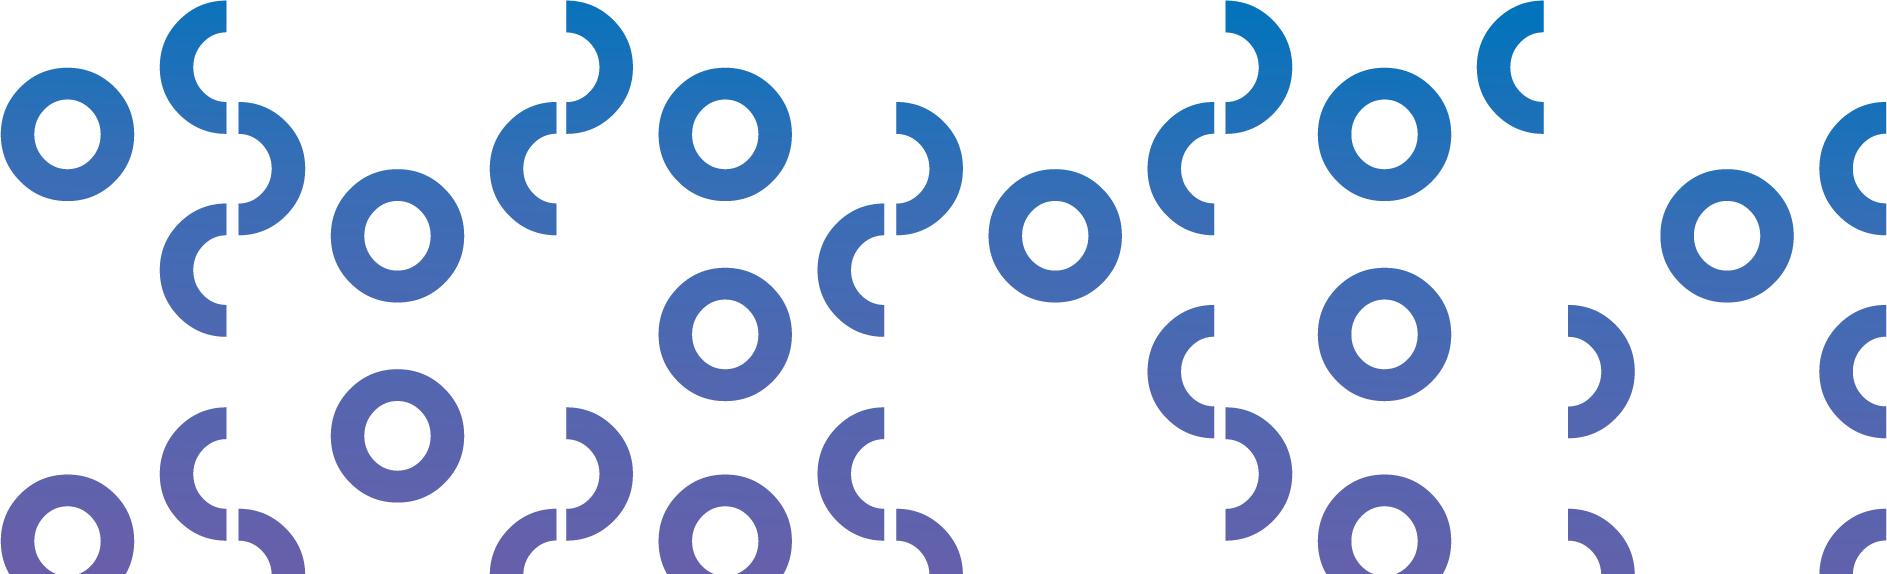 DMS DocDoc.C logo pattern